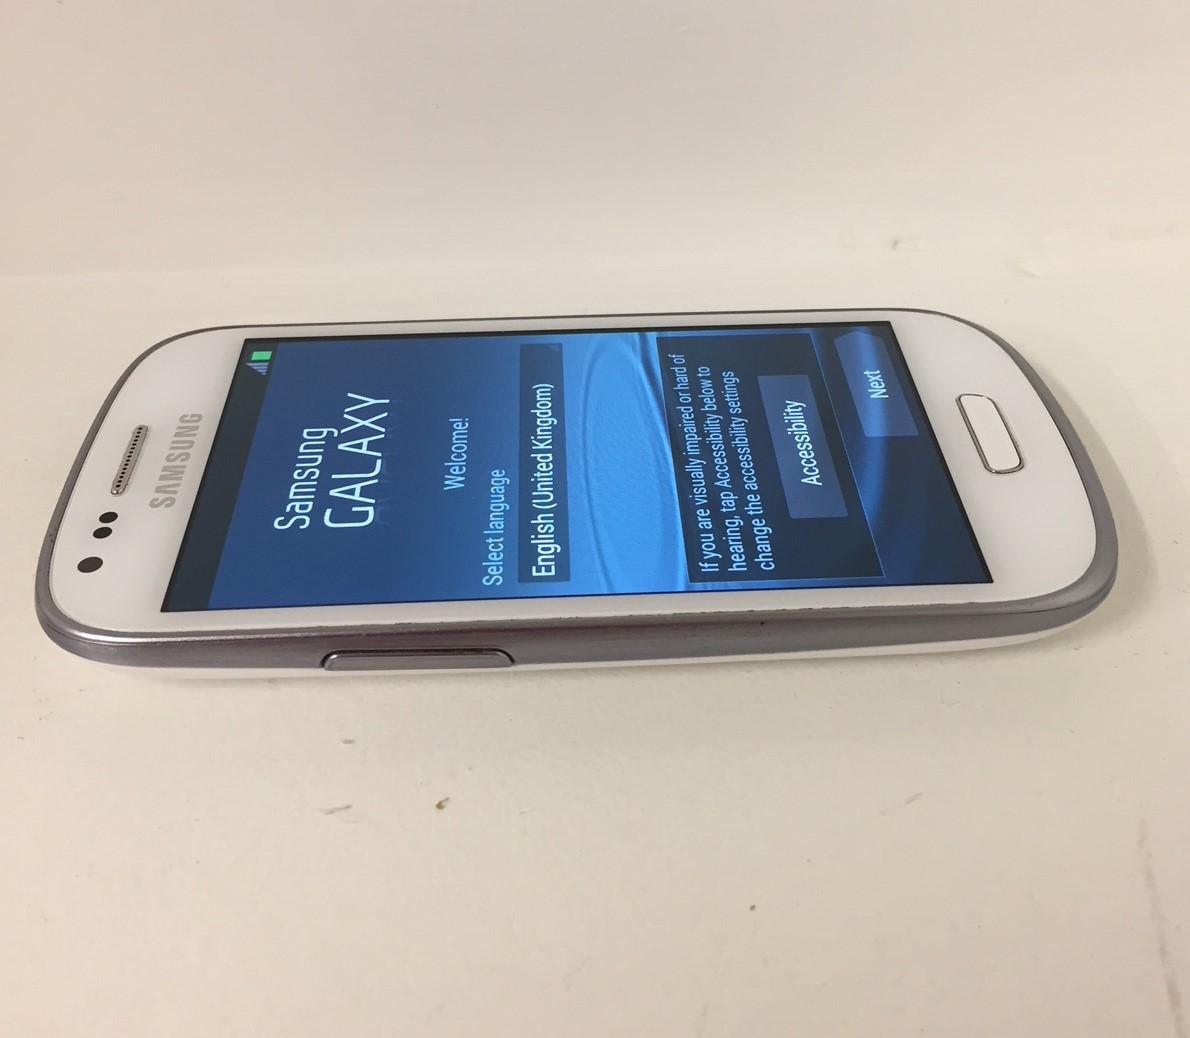 Samsung Galaxy S3 Mini No 3